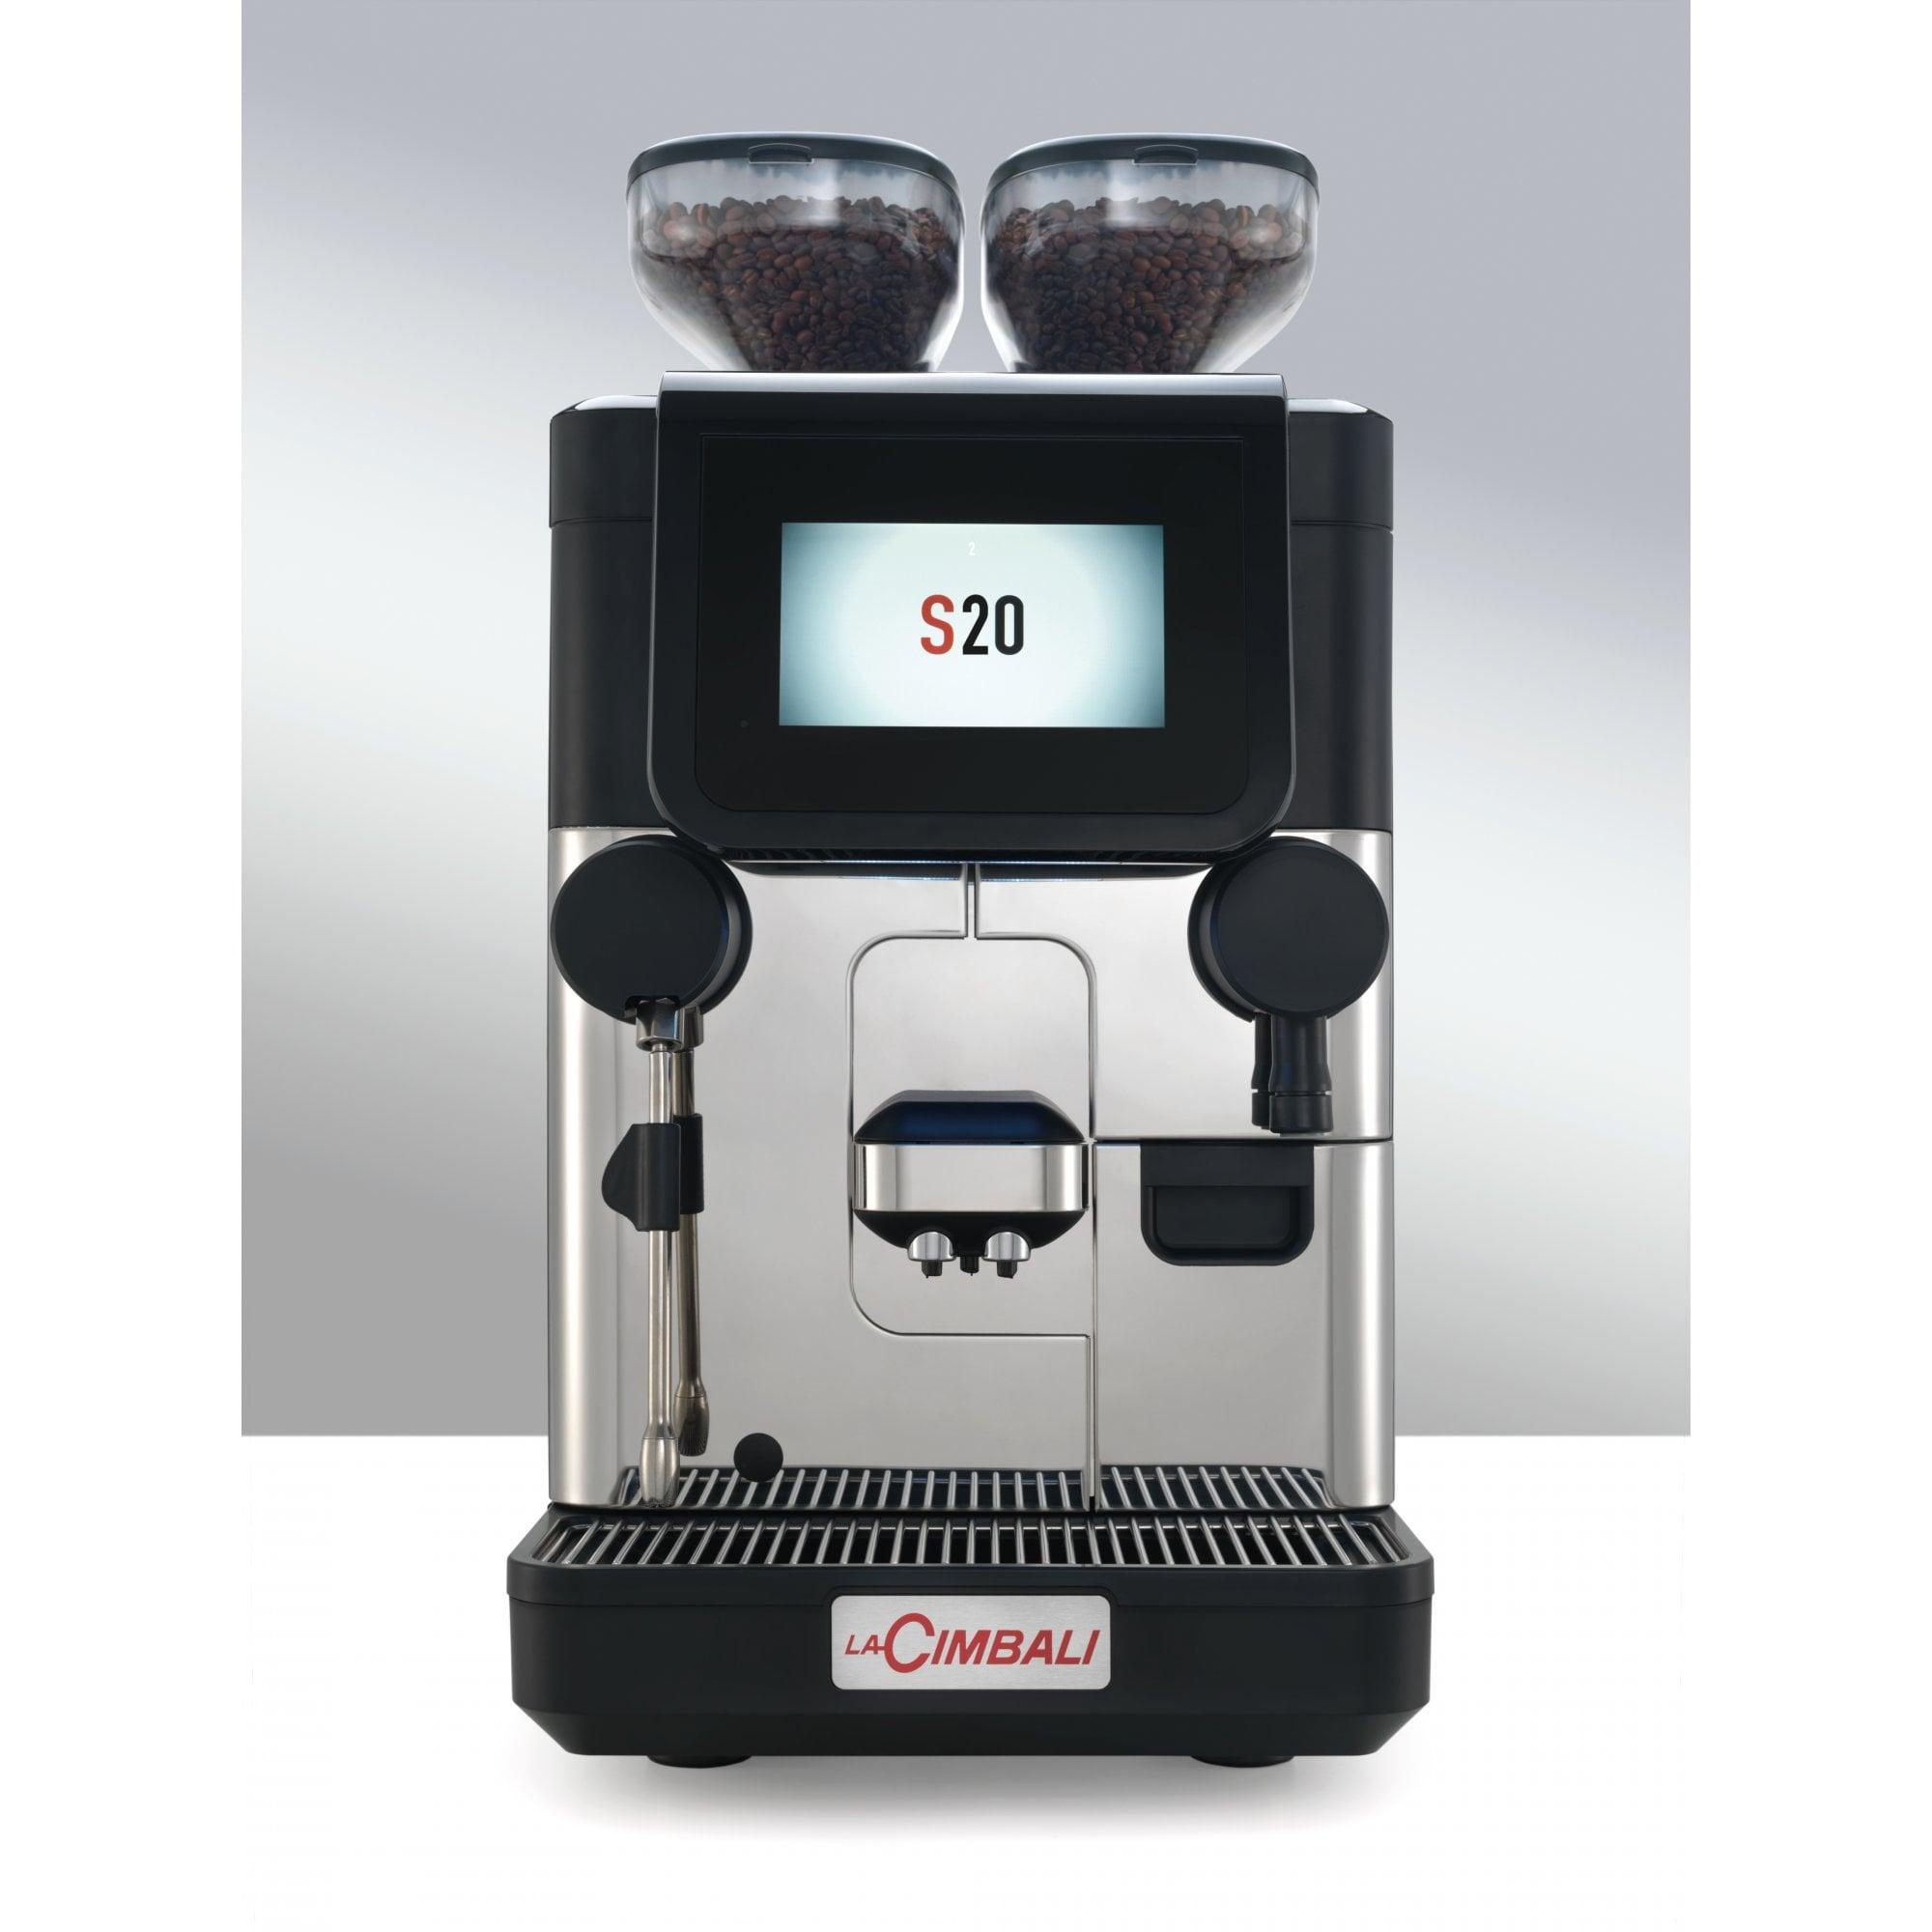 La Cimbali S20 S10 Ts4 Semi Automatic Bean To Cup Machine